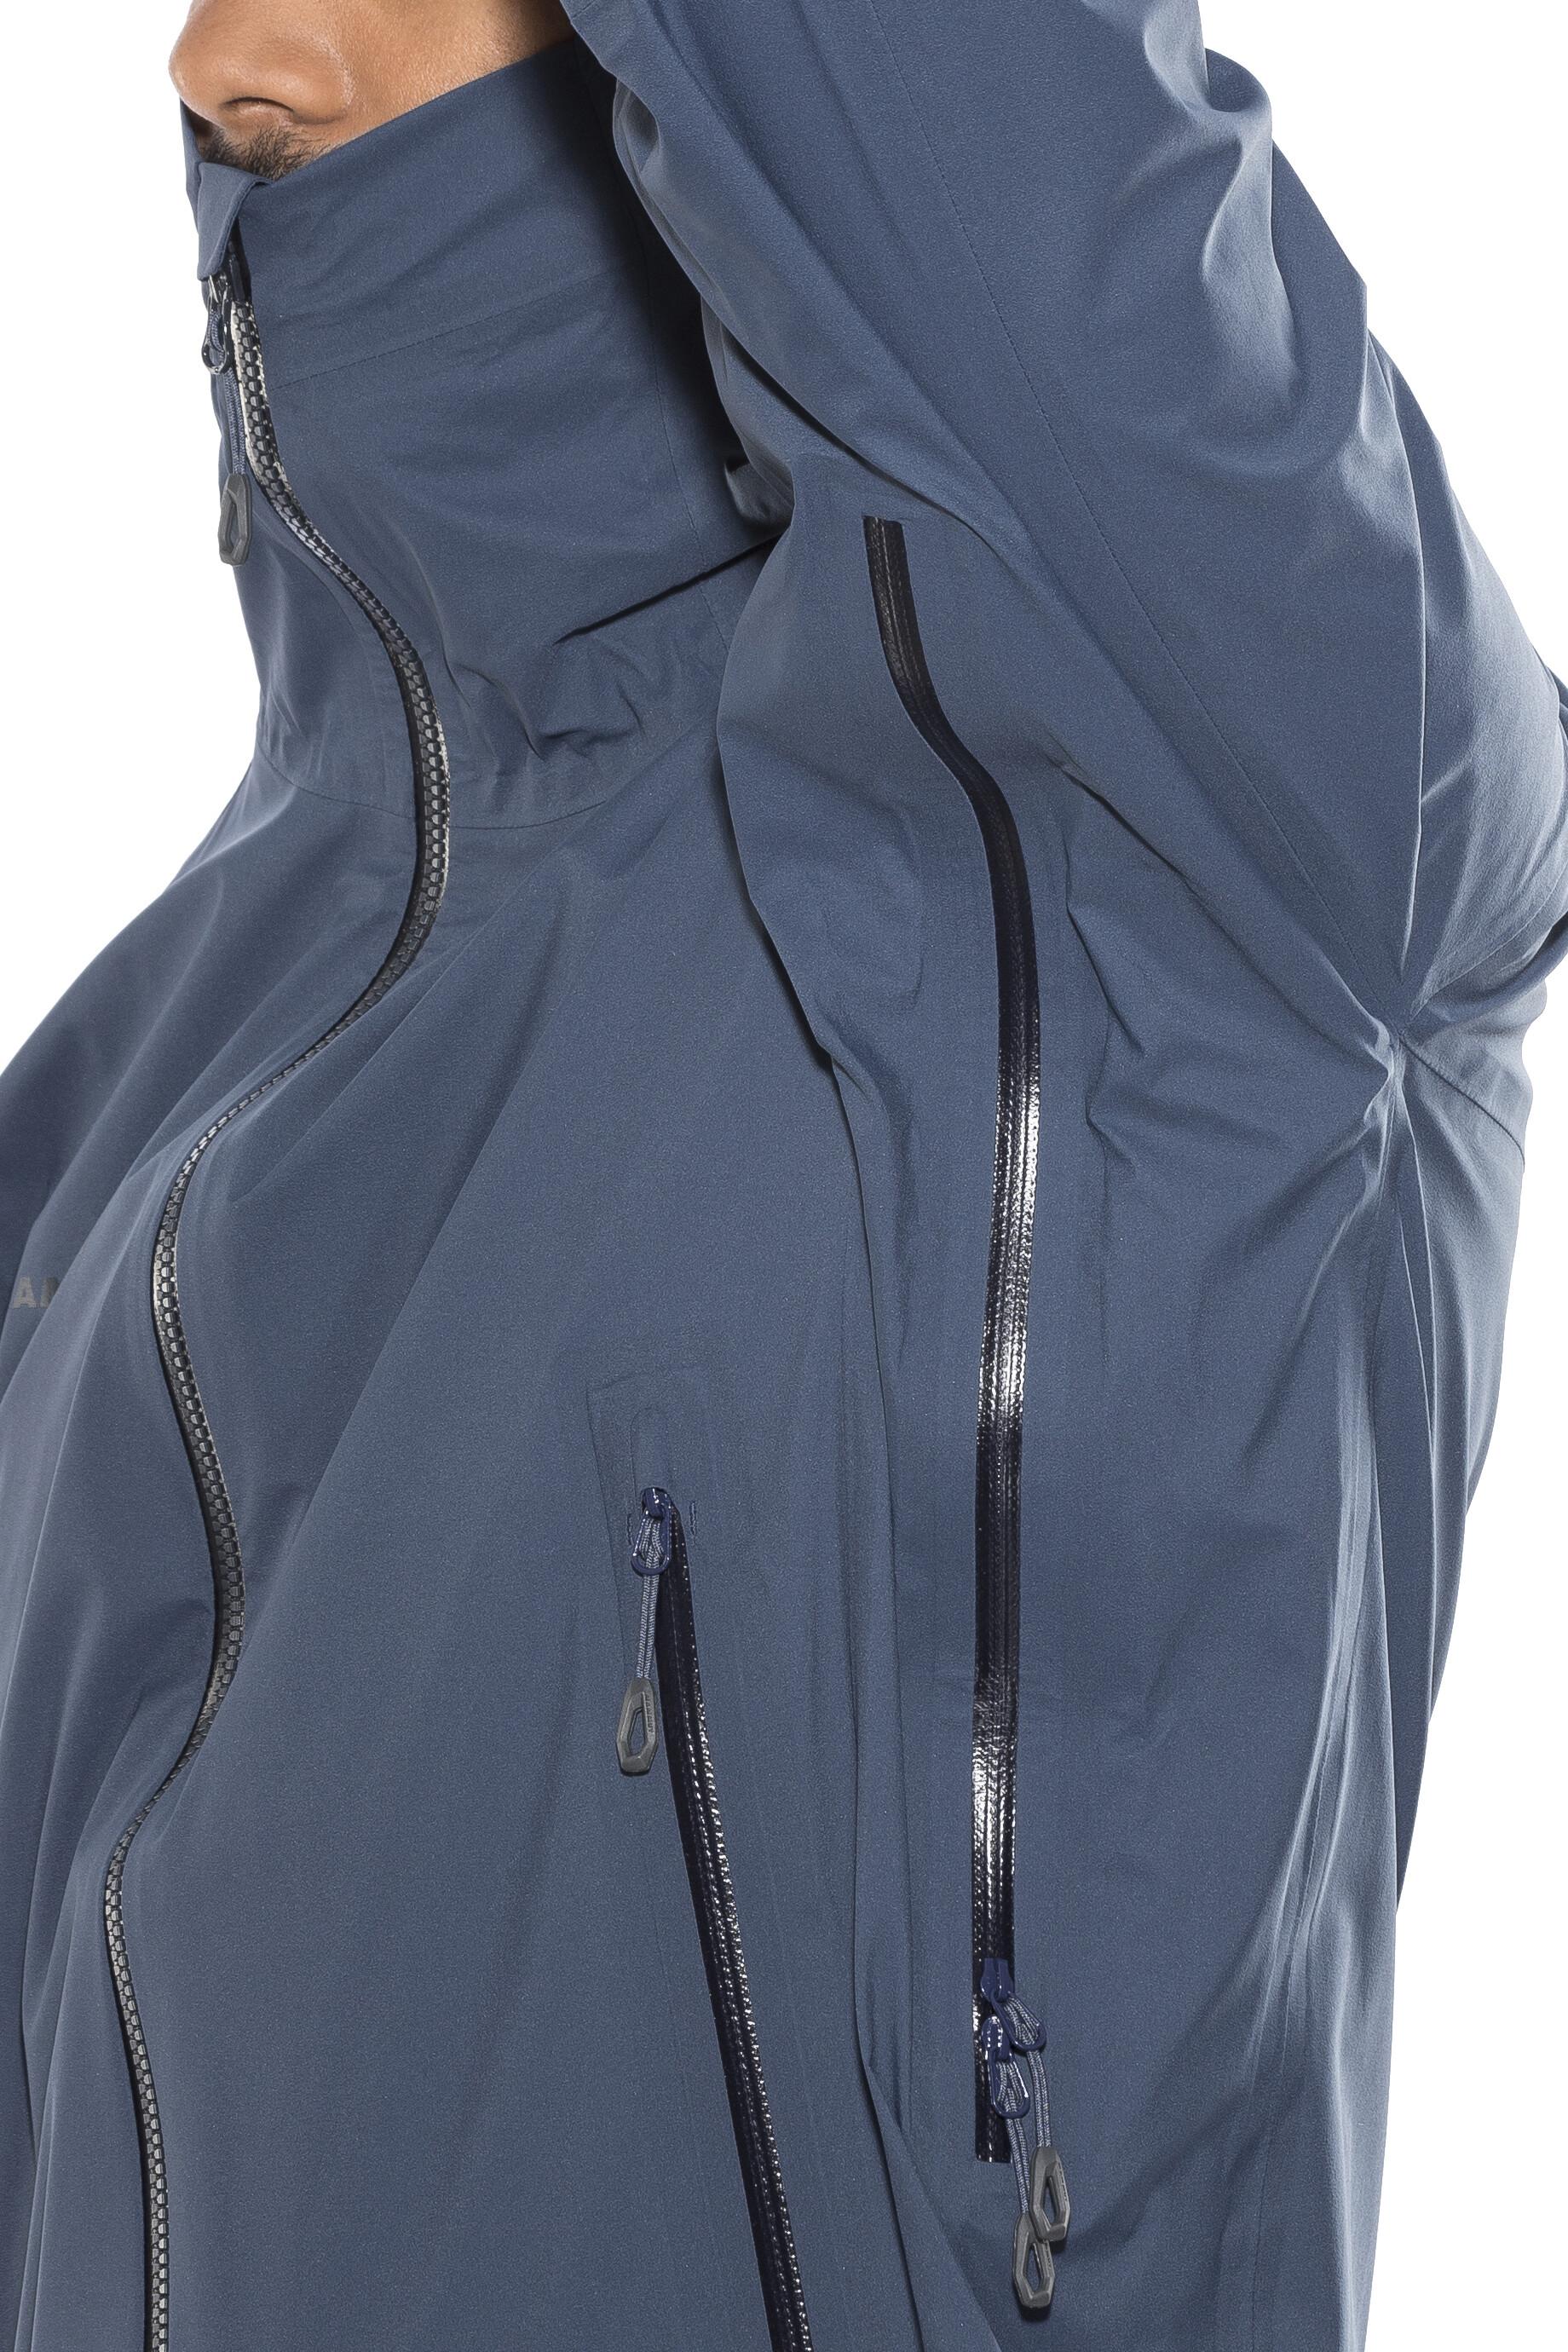 Mammut Masao Light - Chaqueta Hombre - azul  928e8b58415